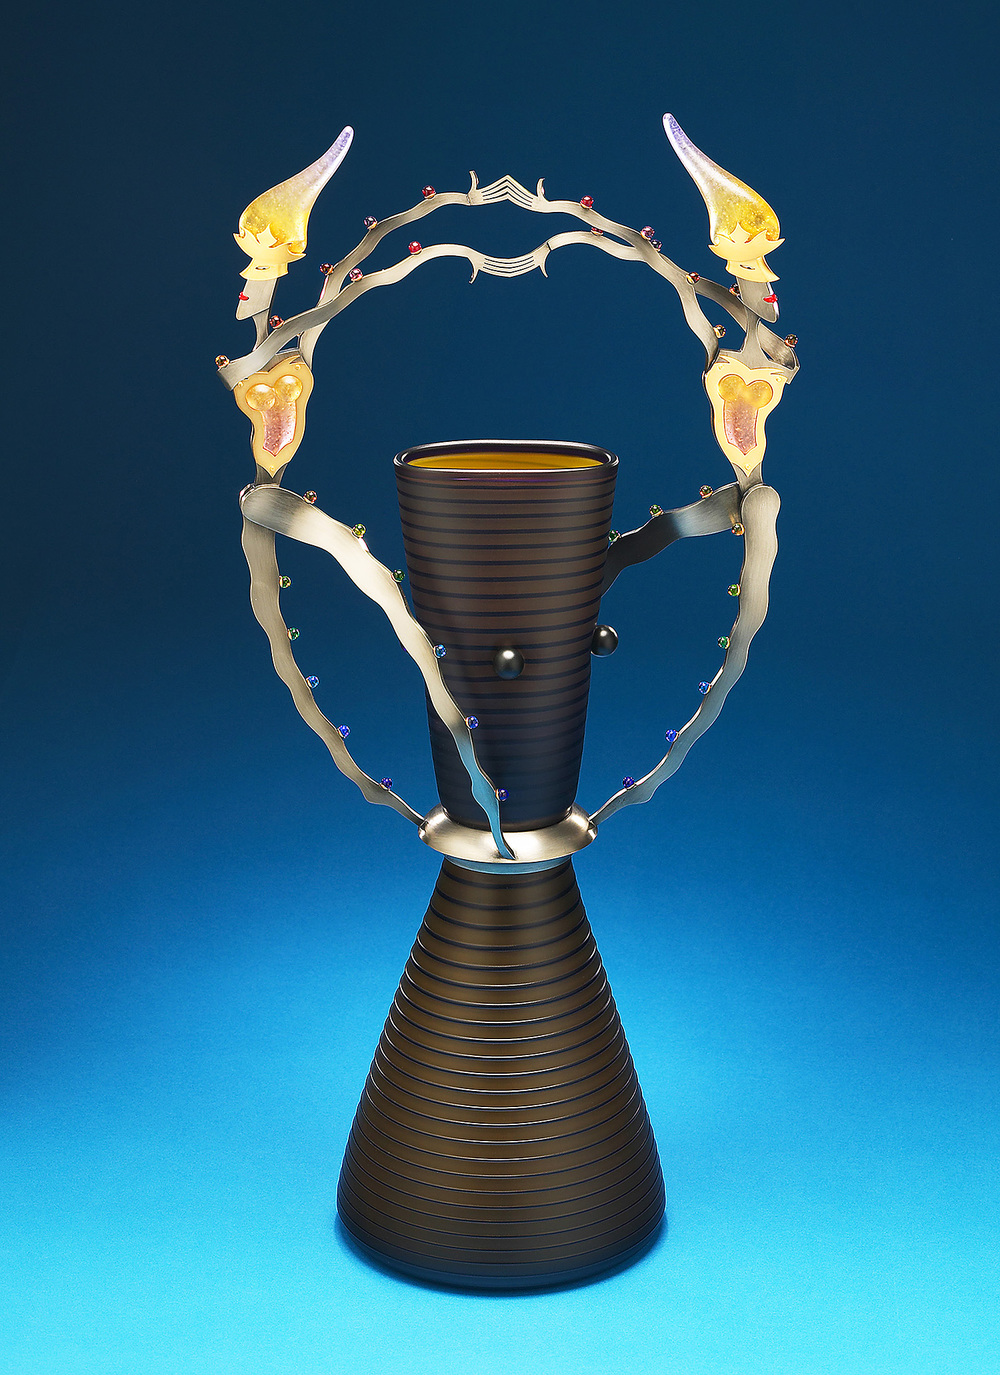 "Flutter   2004. Blown glass, nickel and gold-plated bronze, pate de verre, Vitrolite. 27½ x 13½ x 8"""